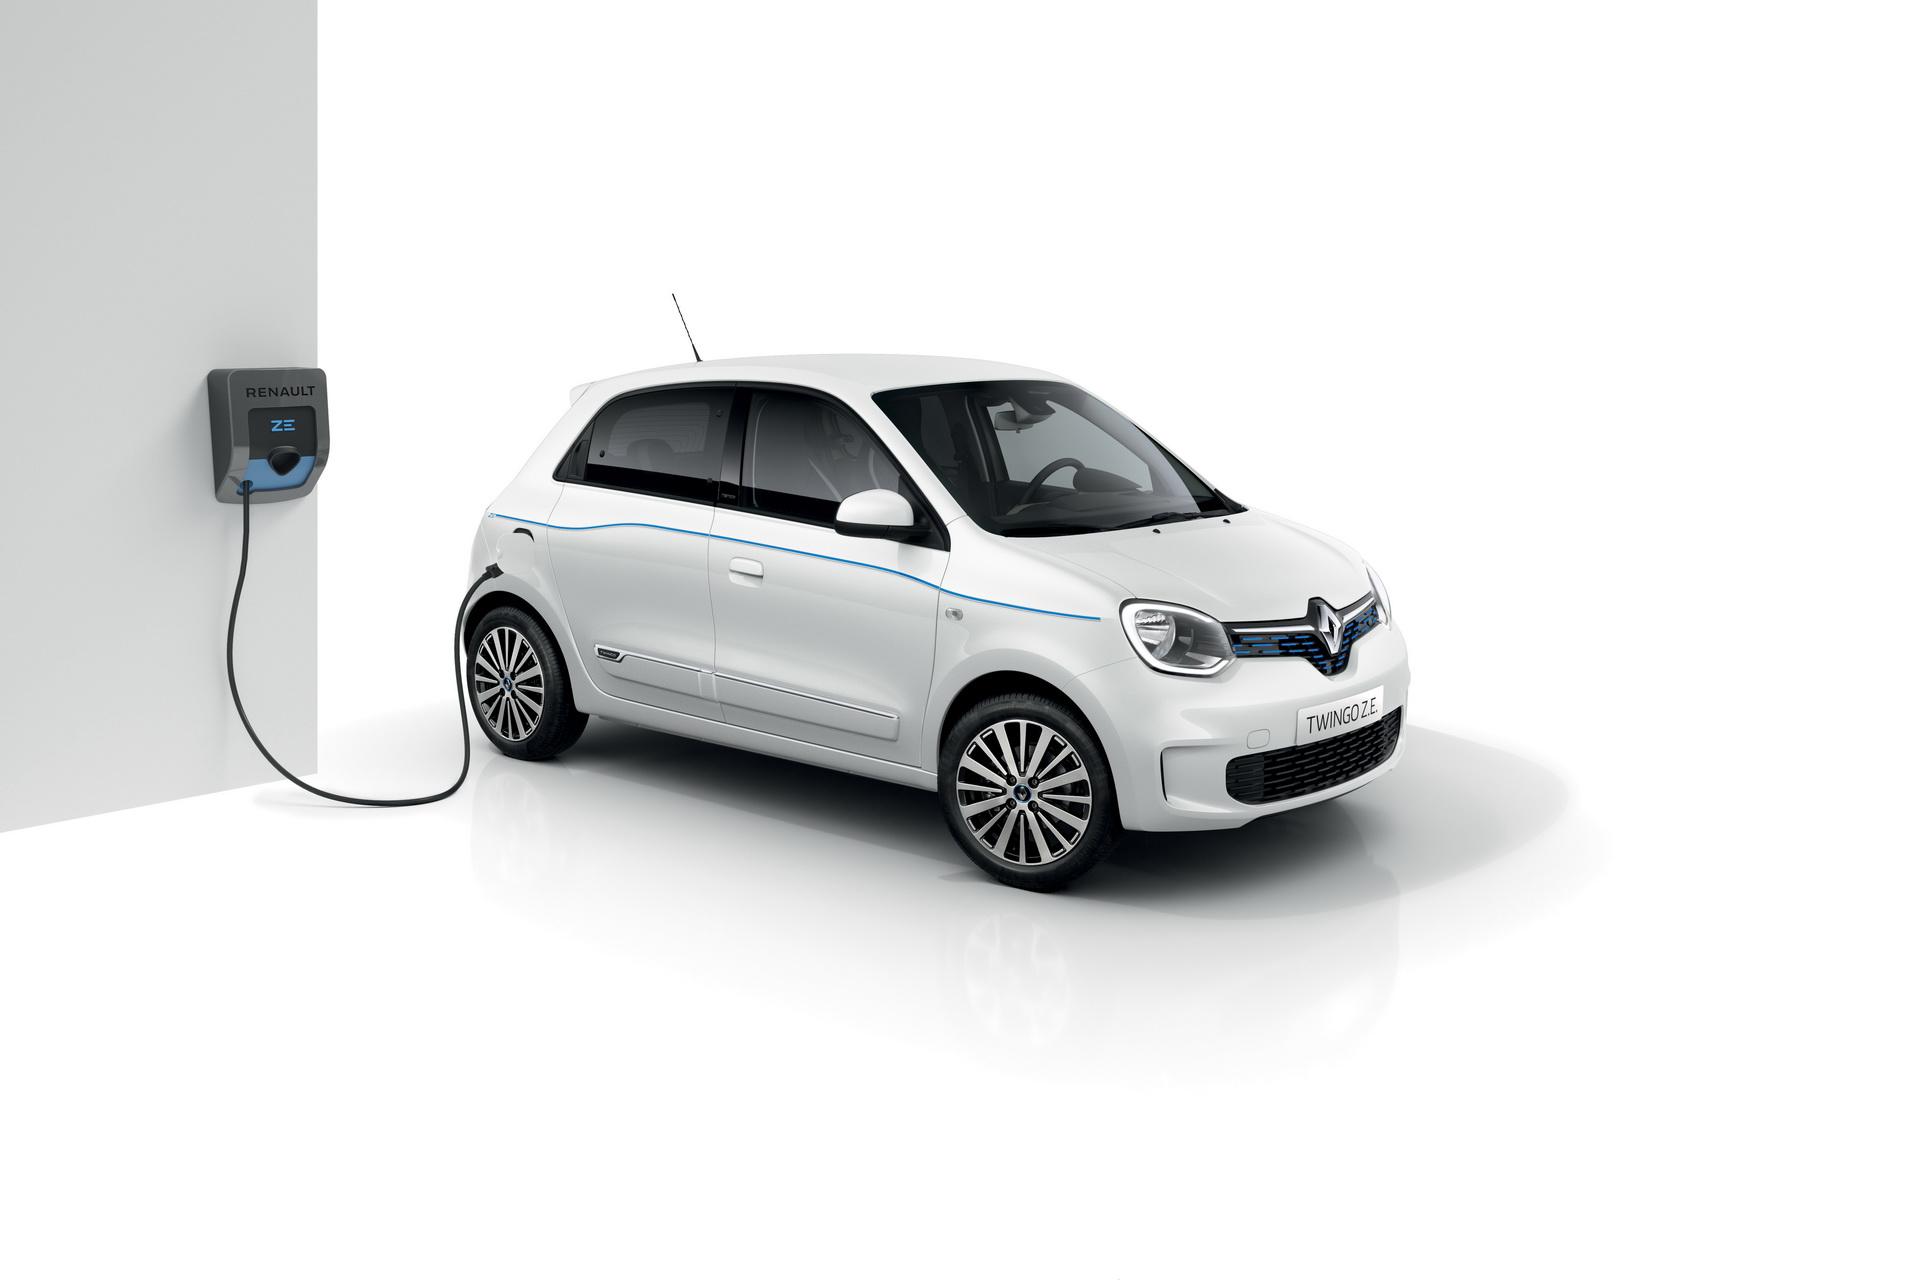 2020-renault-twingo-ze-electric-city-car-7